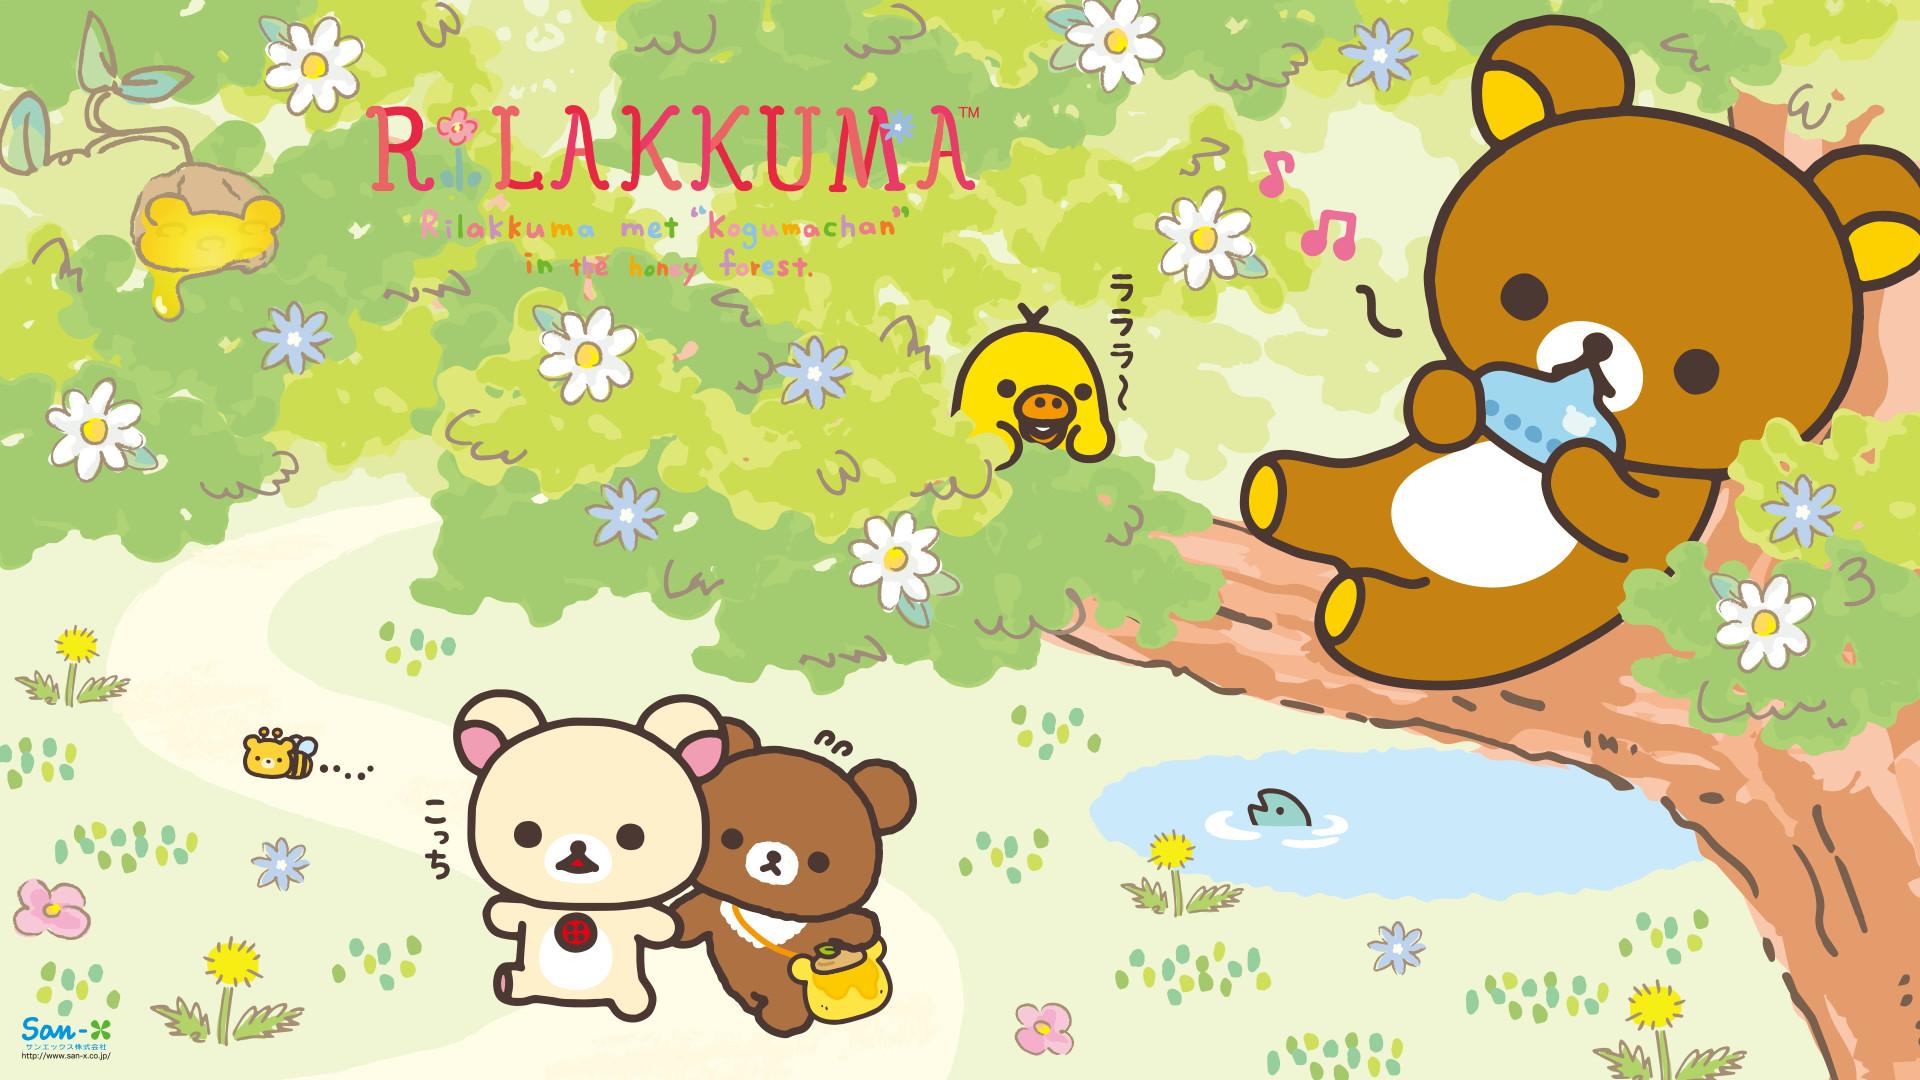 Kawaii Desktop Backgrounds (68+ Images